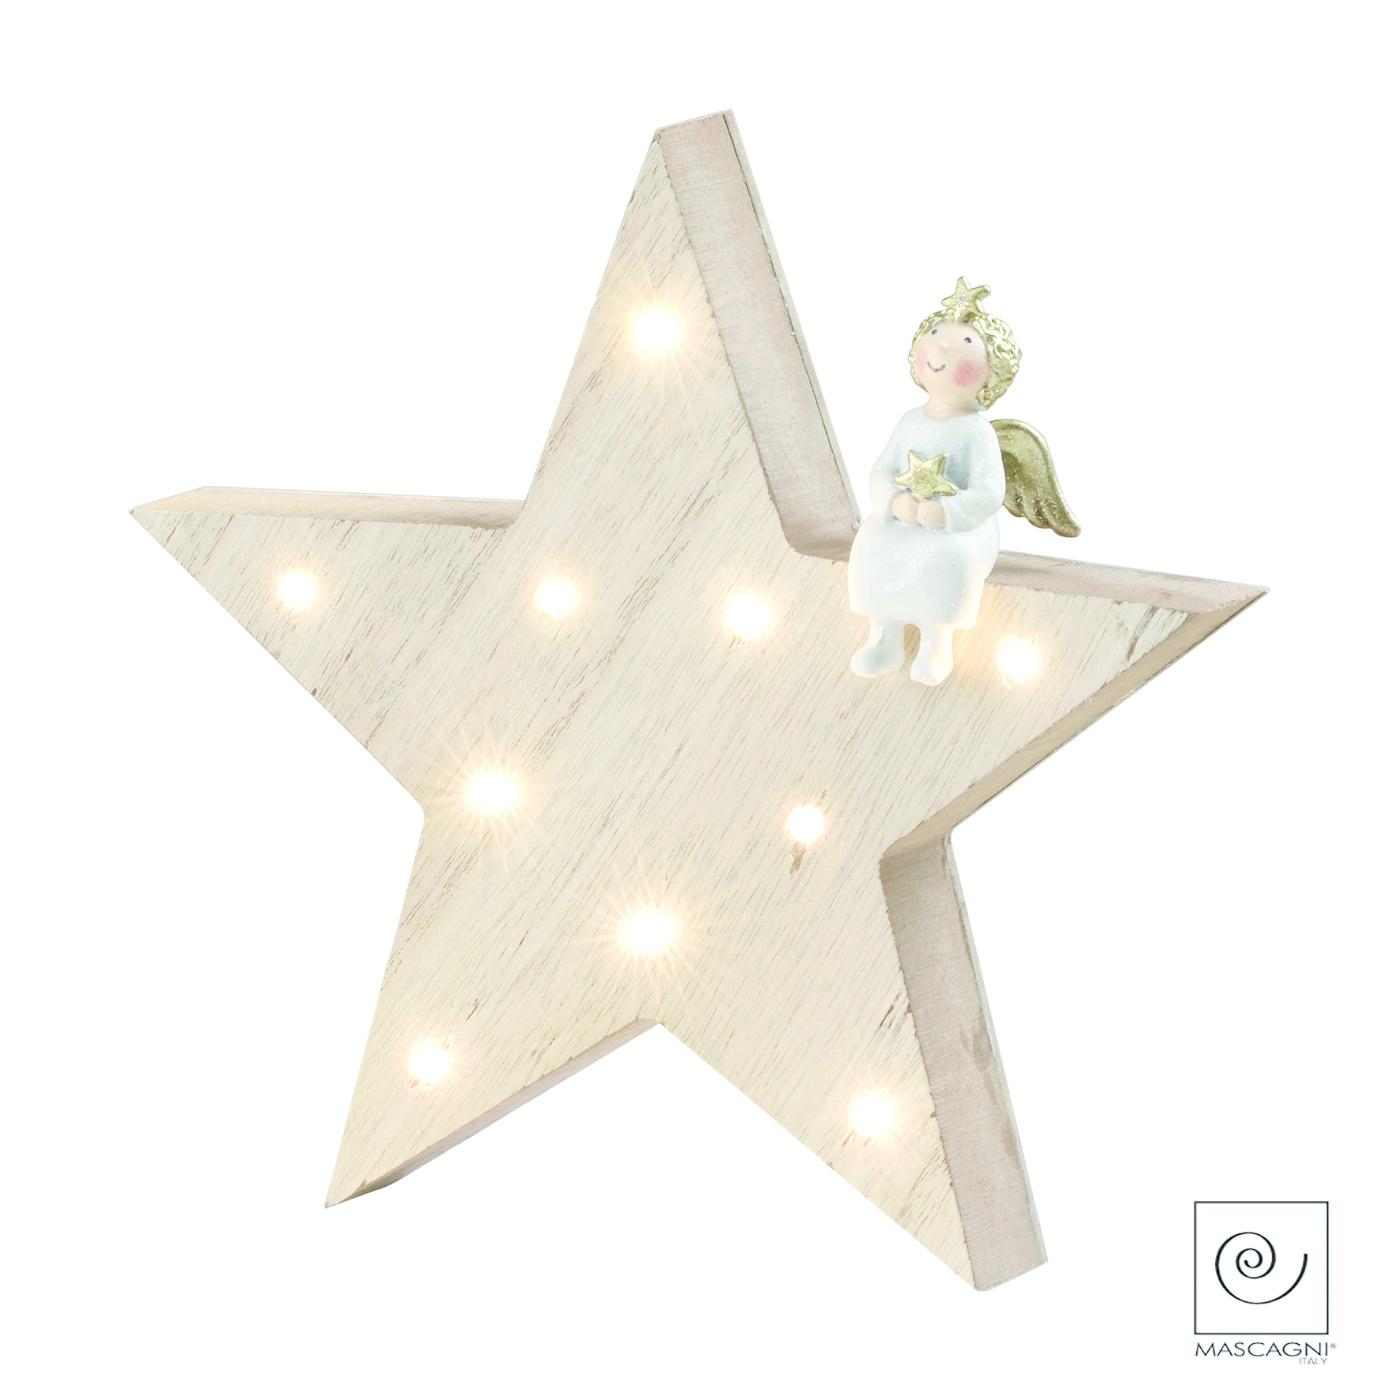 Art Mascagni LED STAR CM.21